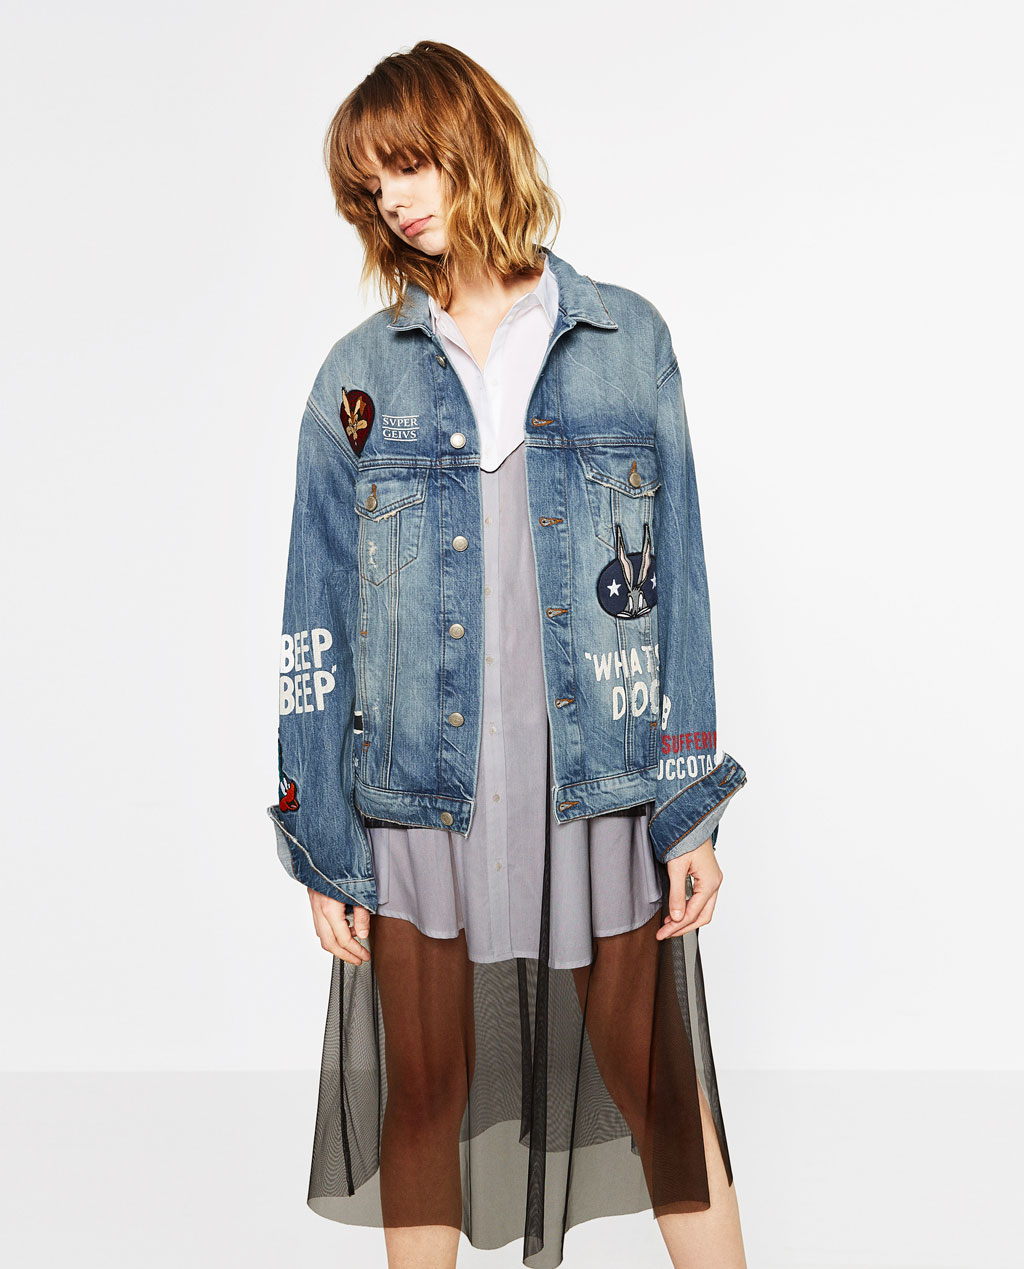 2017 ZA Long Sleeve Embroidery Denim Jacket Jacket Denim ...